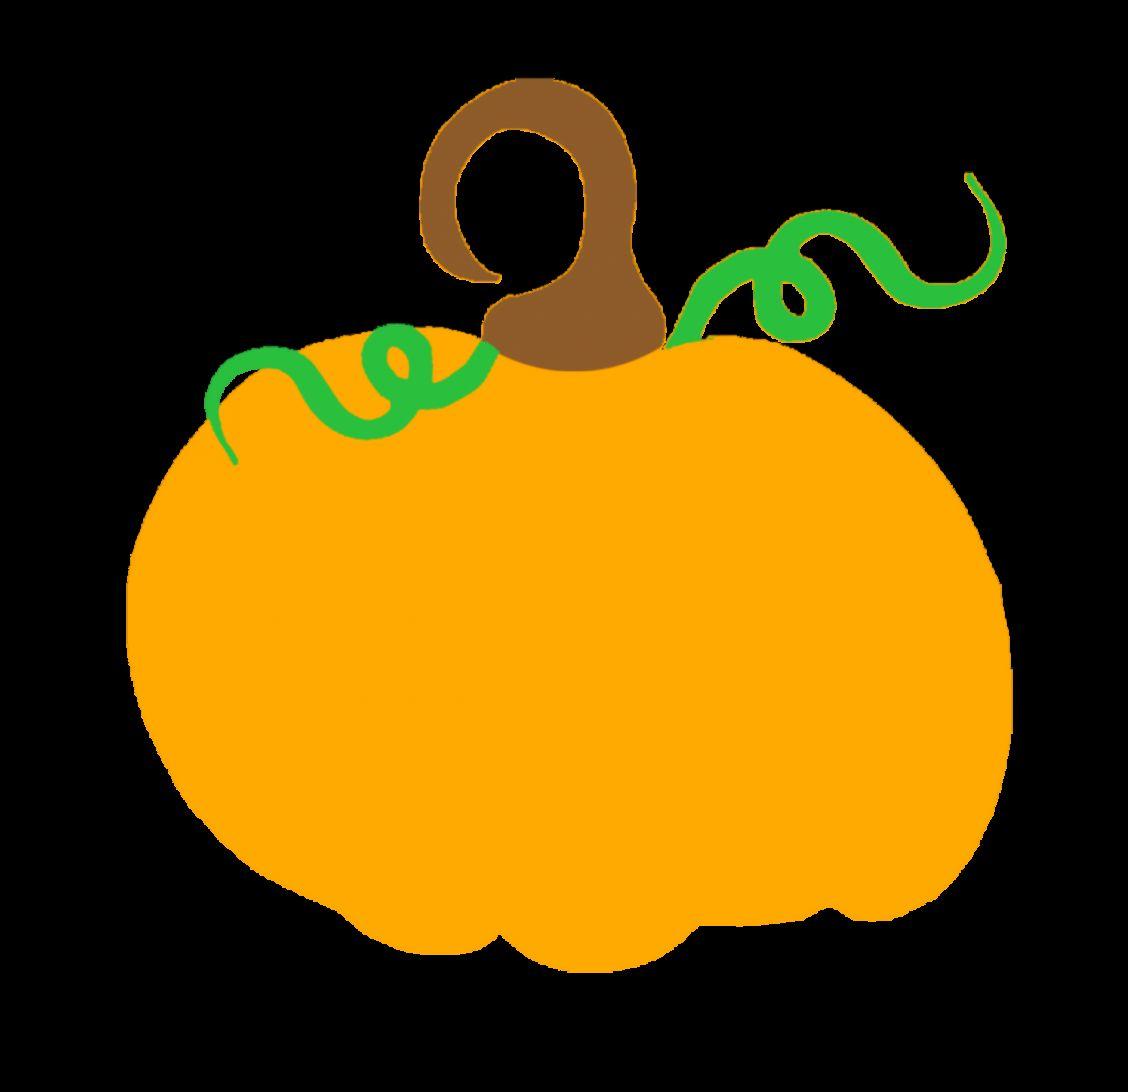 Pumpkin clipart image 151